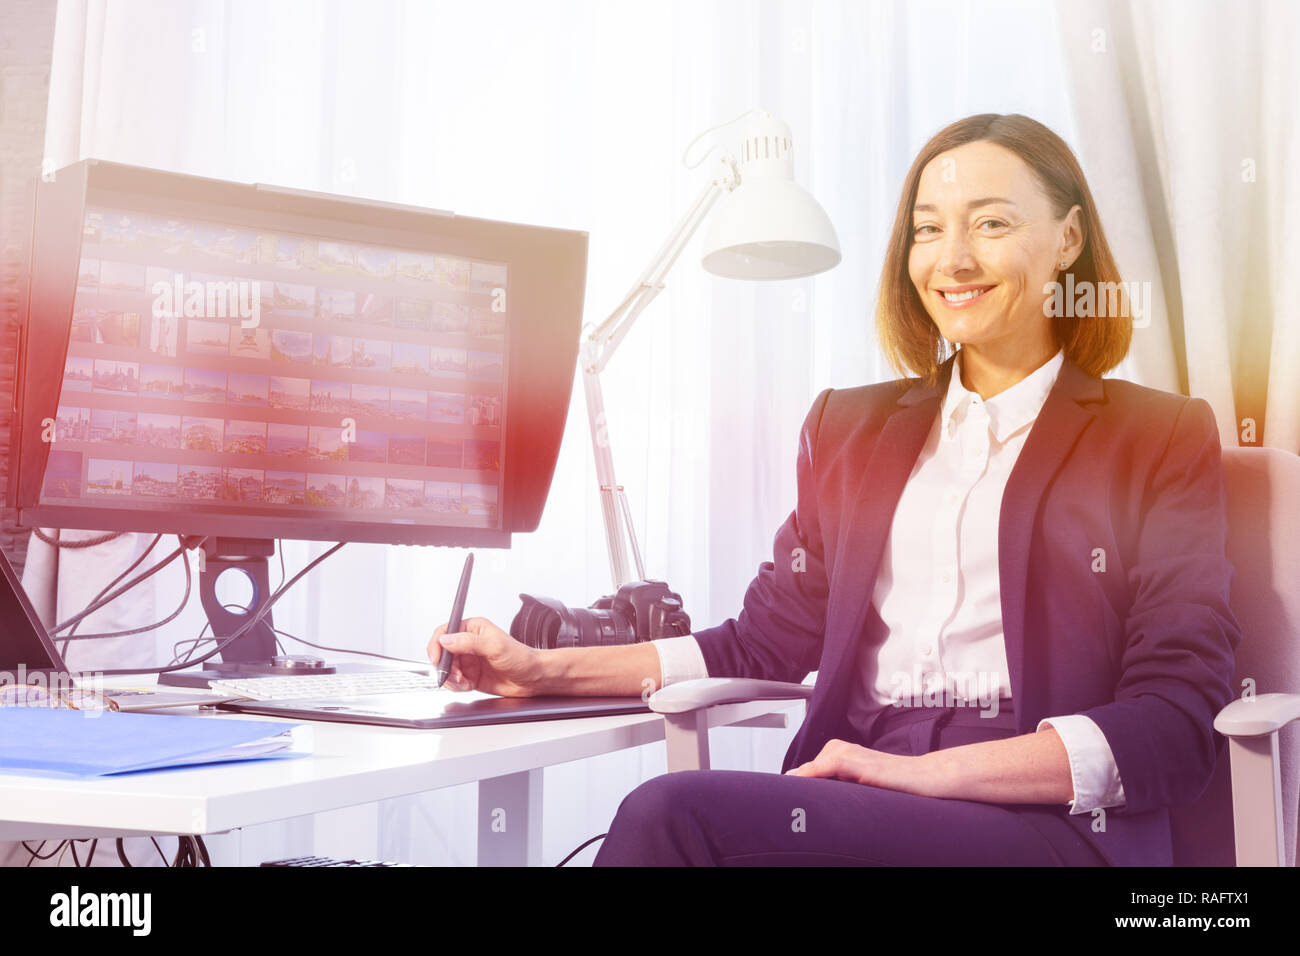 Frau arbeiten mit Image Editor im Büro Stockbild